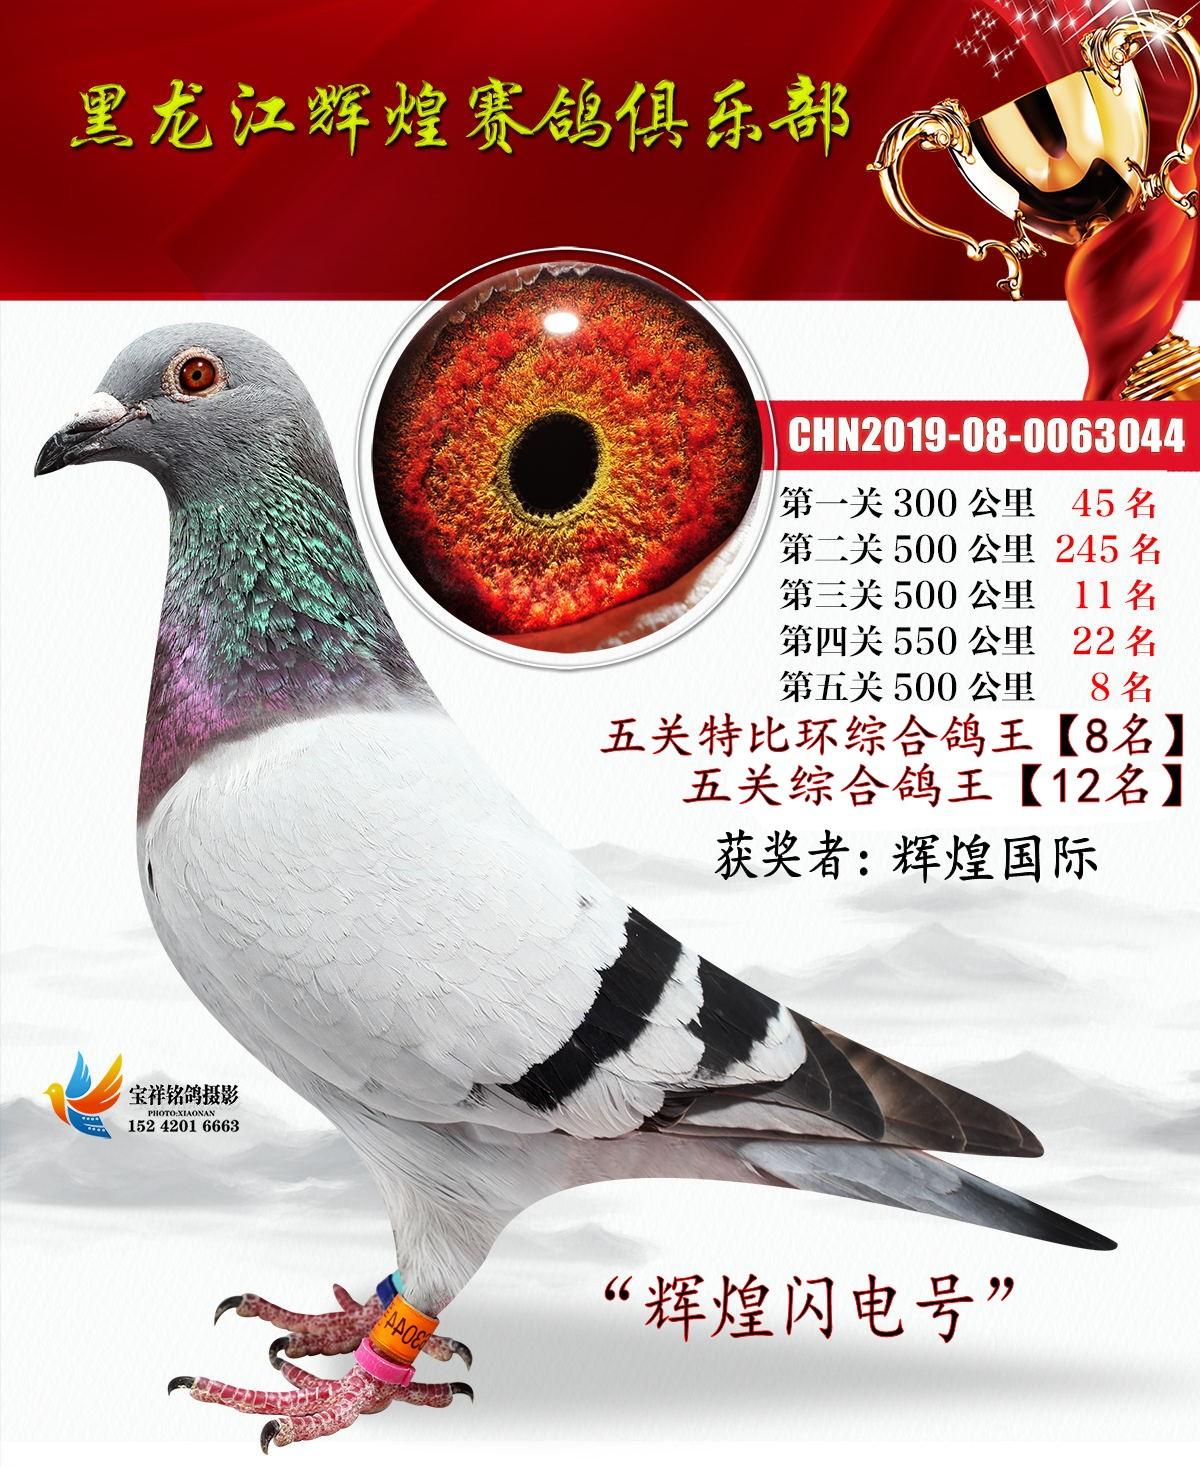 五关综合鸽王8名